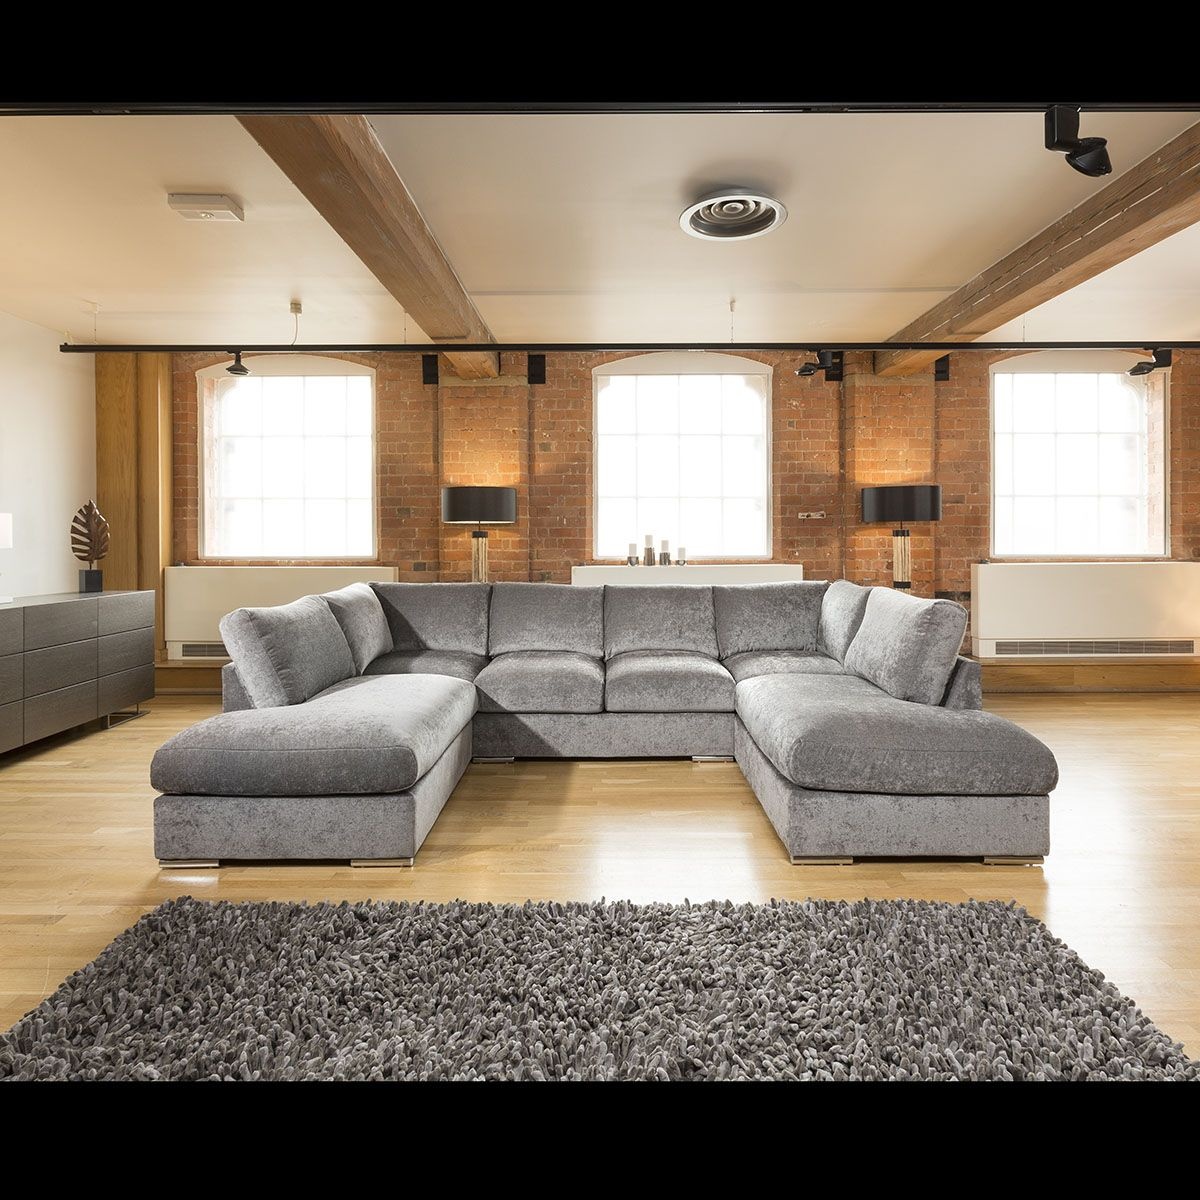 Quatropi Large Corner Sofa Group U Shaped Grey 3.3 x 2.1m